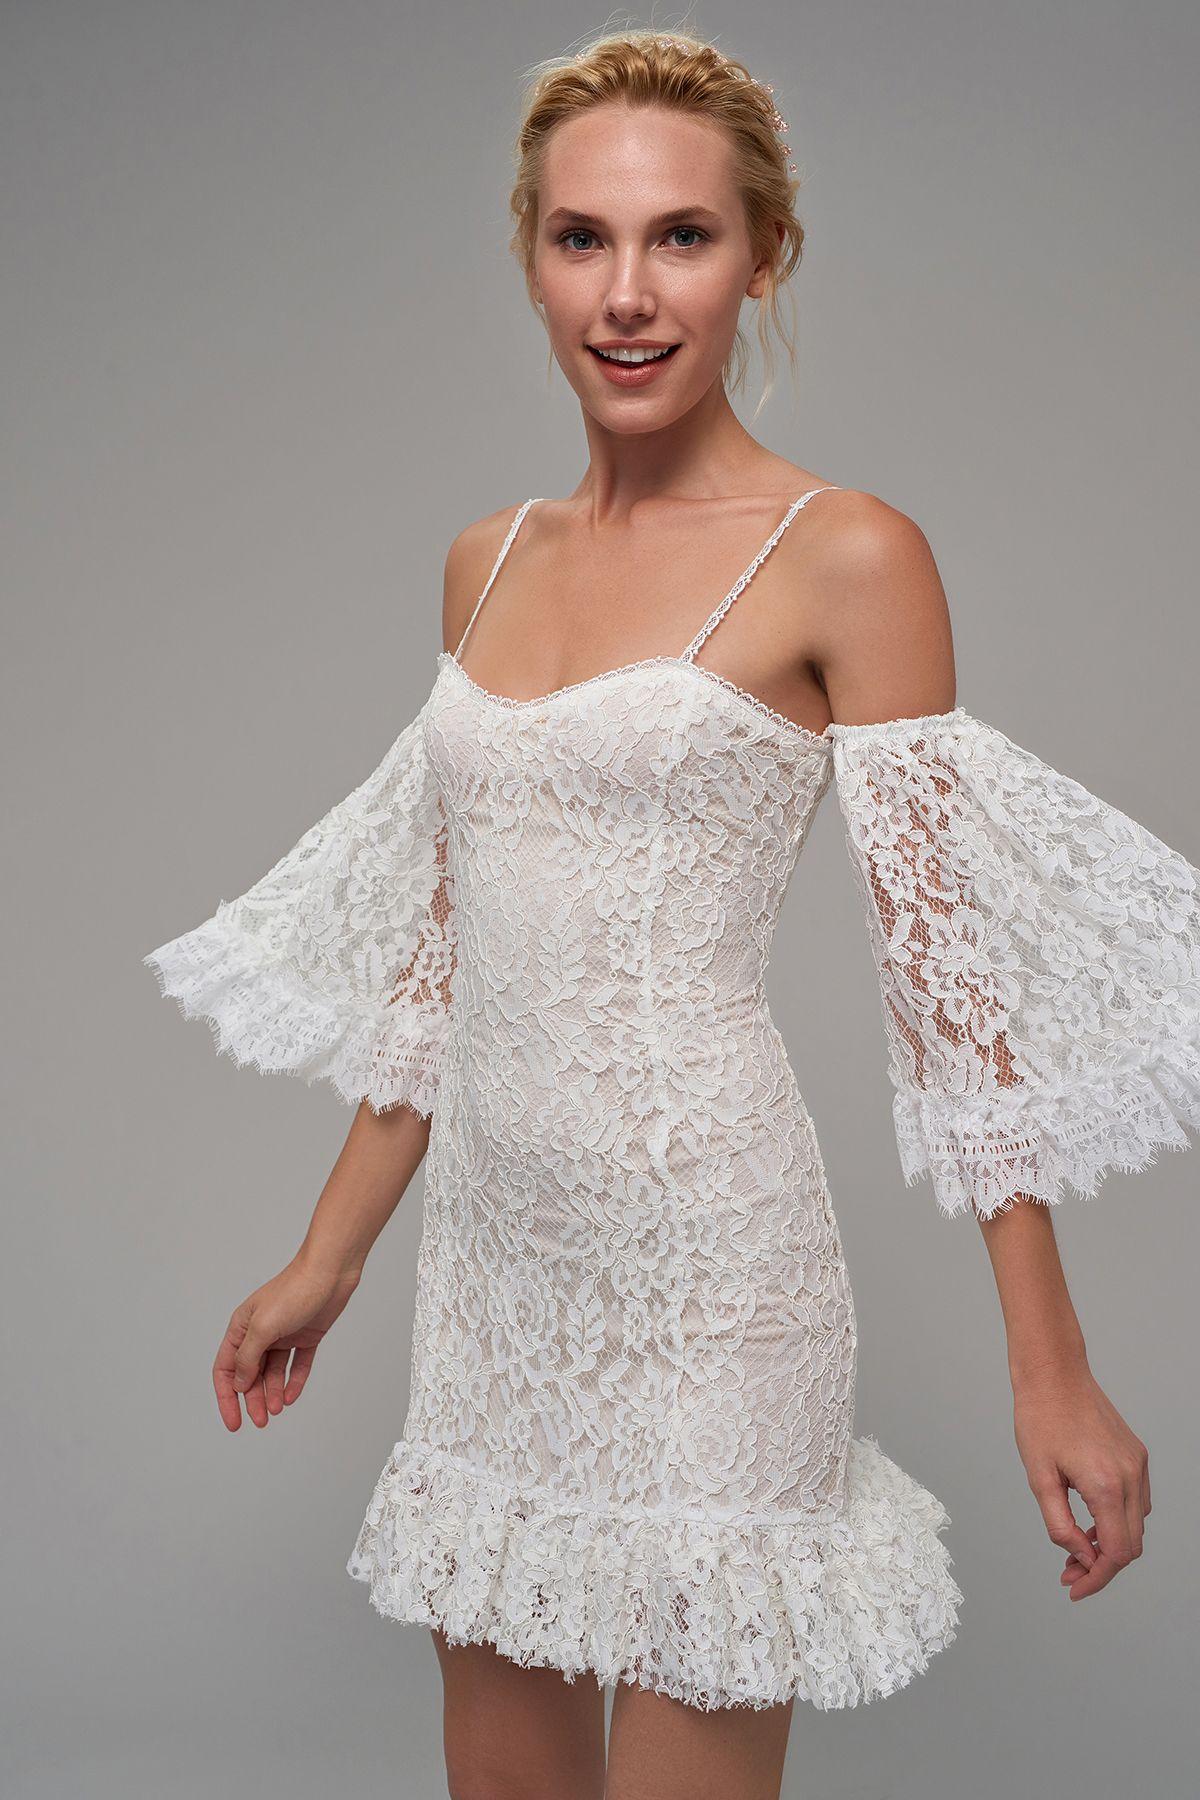 Ekru Godeli Gupur Elbise Trendyolmilla Trendyol Elbise Modelleri Elbise Kisa Elbiseler